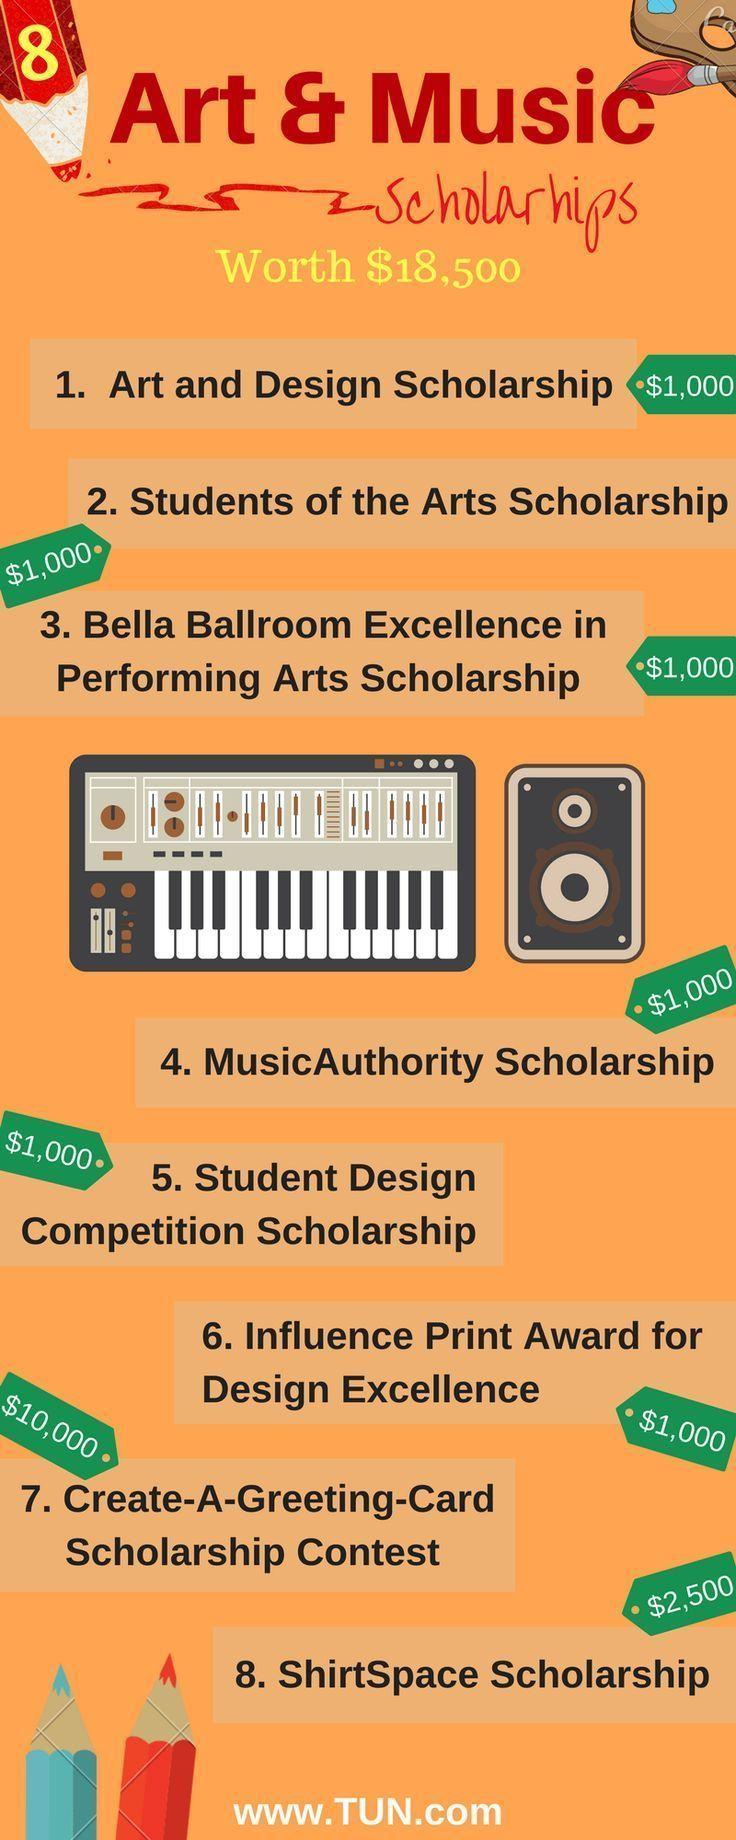 7 Art & Music Scholarships Worth 16,000 Scholarships